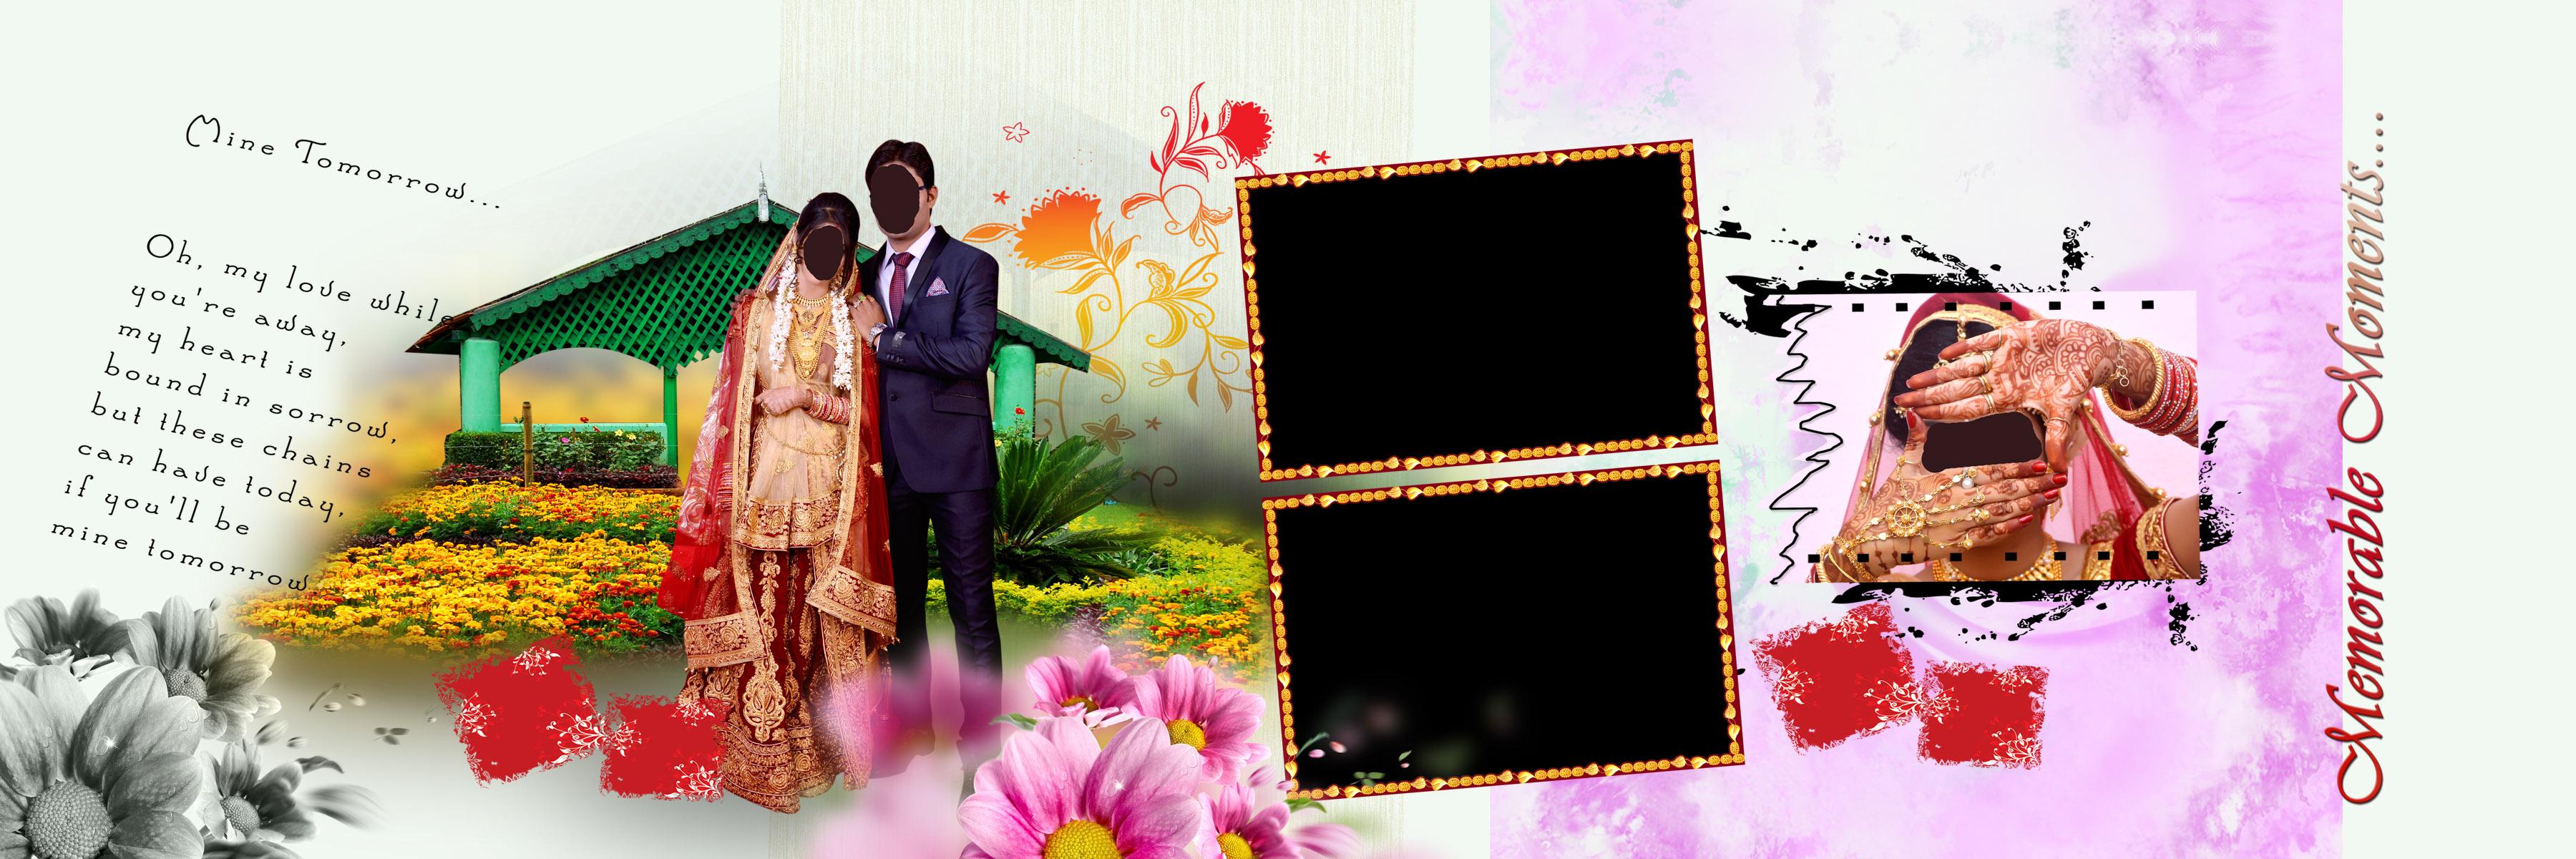 Photoshop Wedding Album Design Psd Free Download Indian